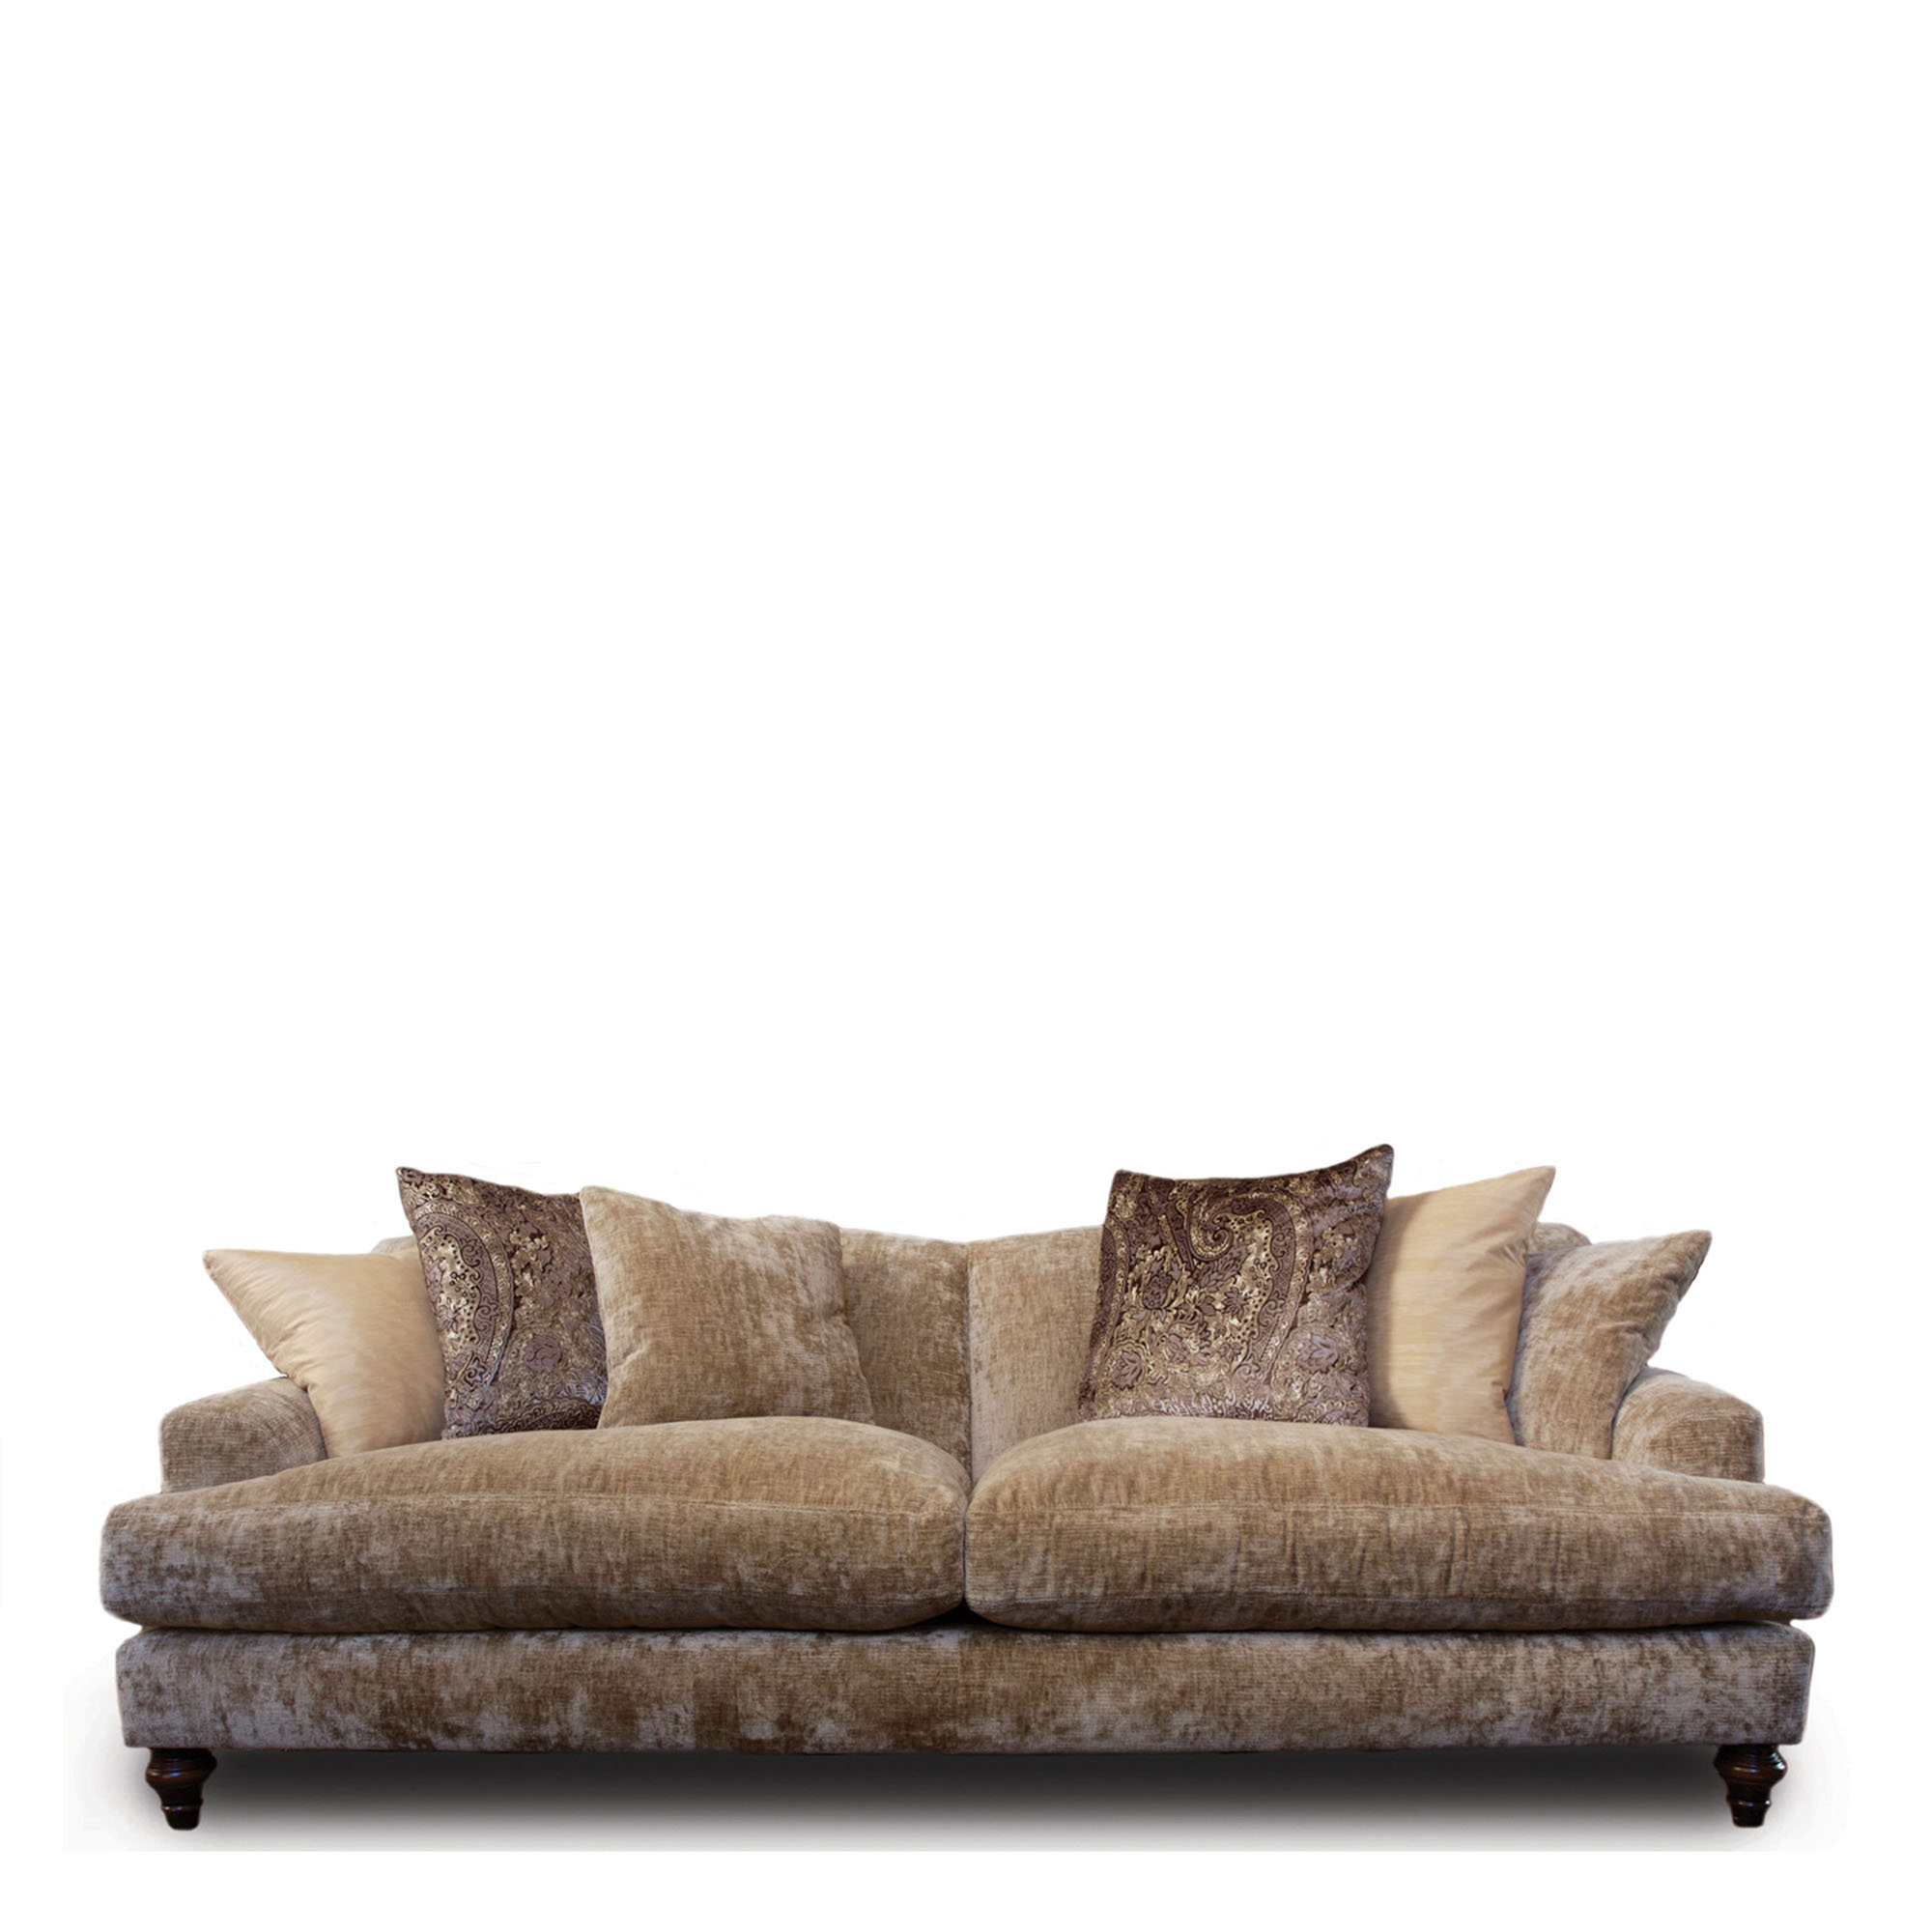 Woburn Grand Sofa 4 Seat Sofa Fishpools